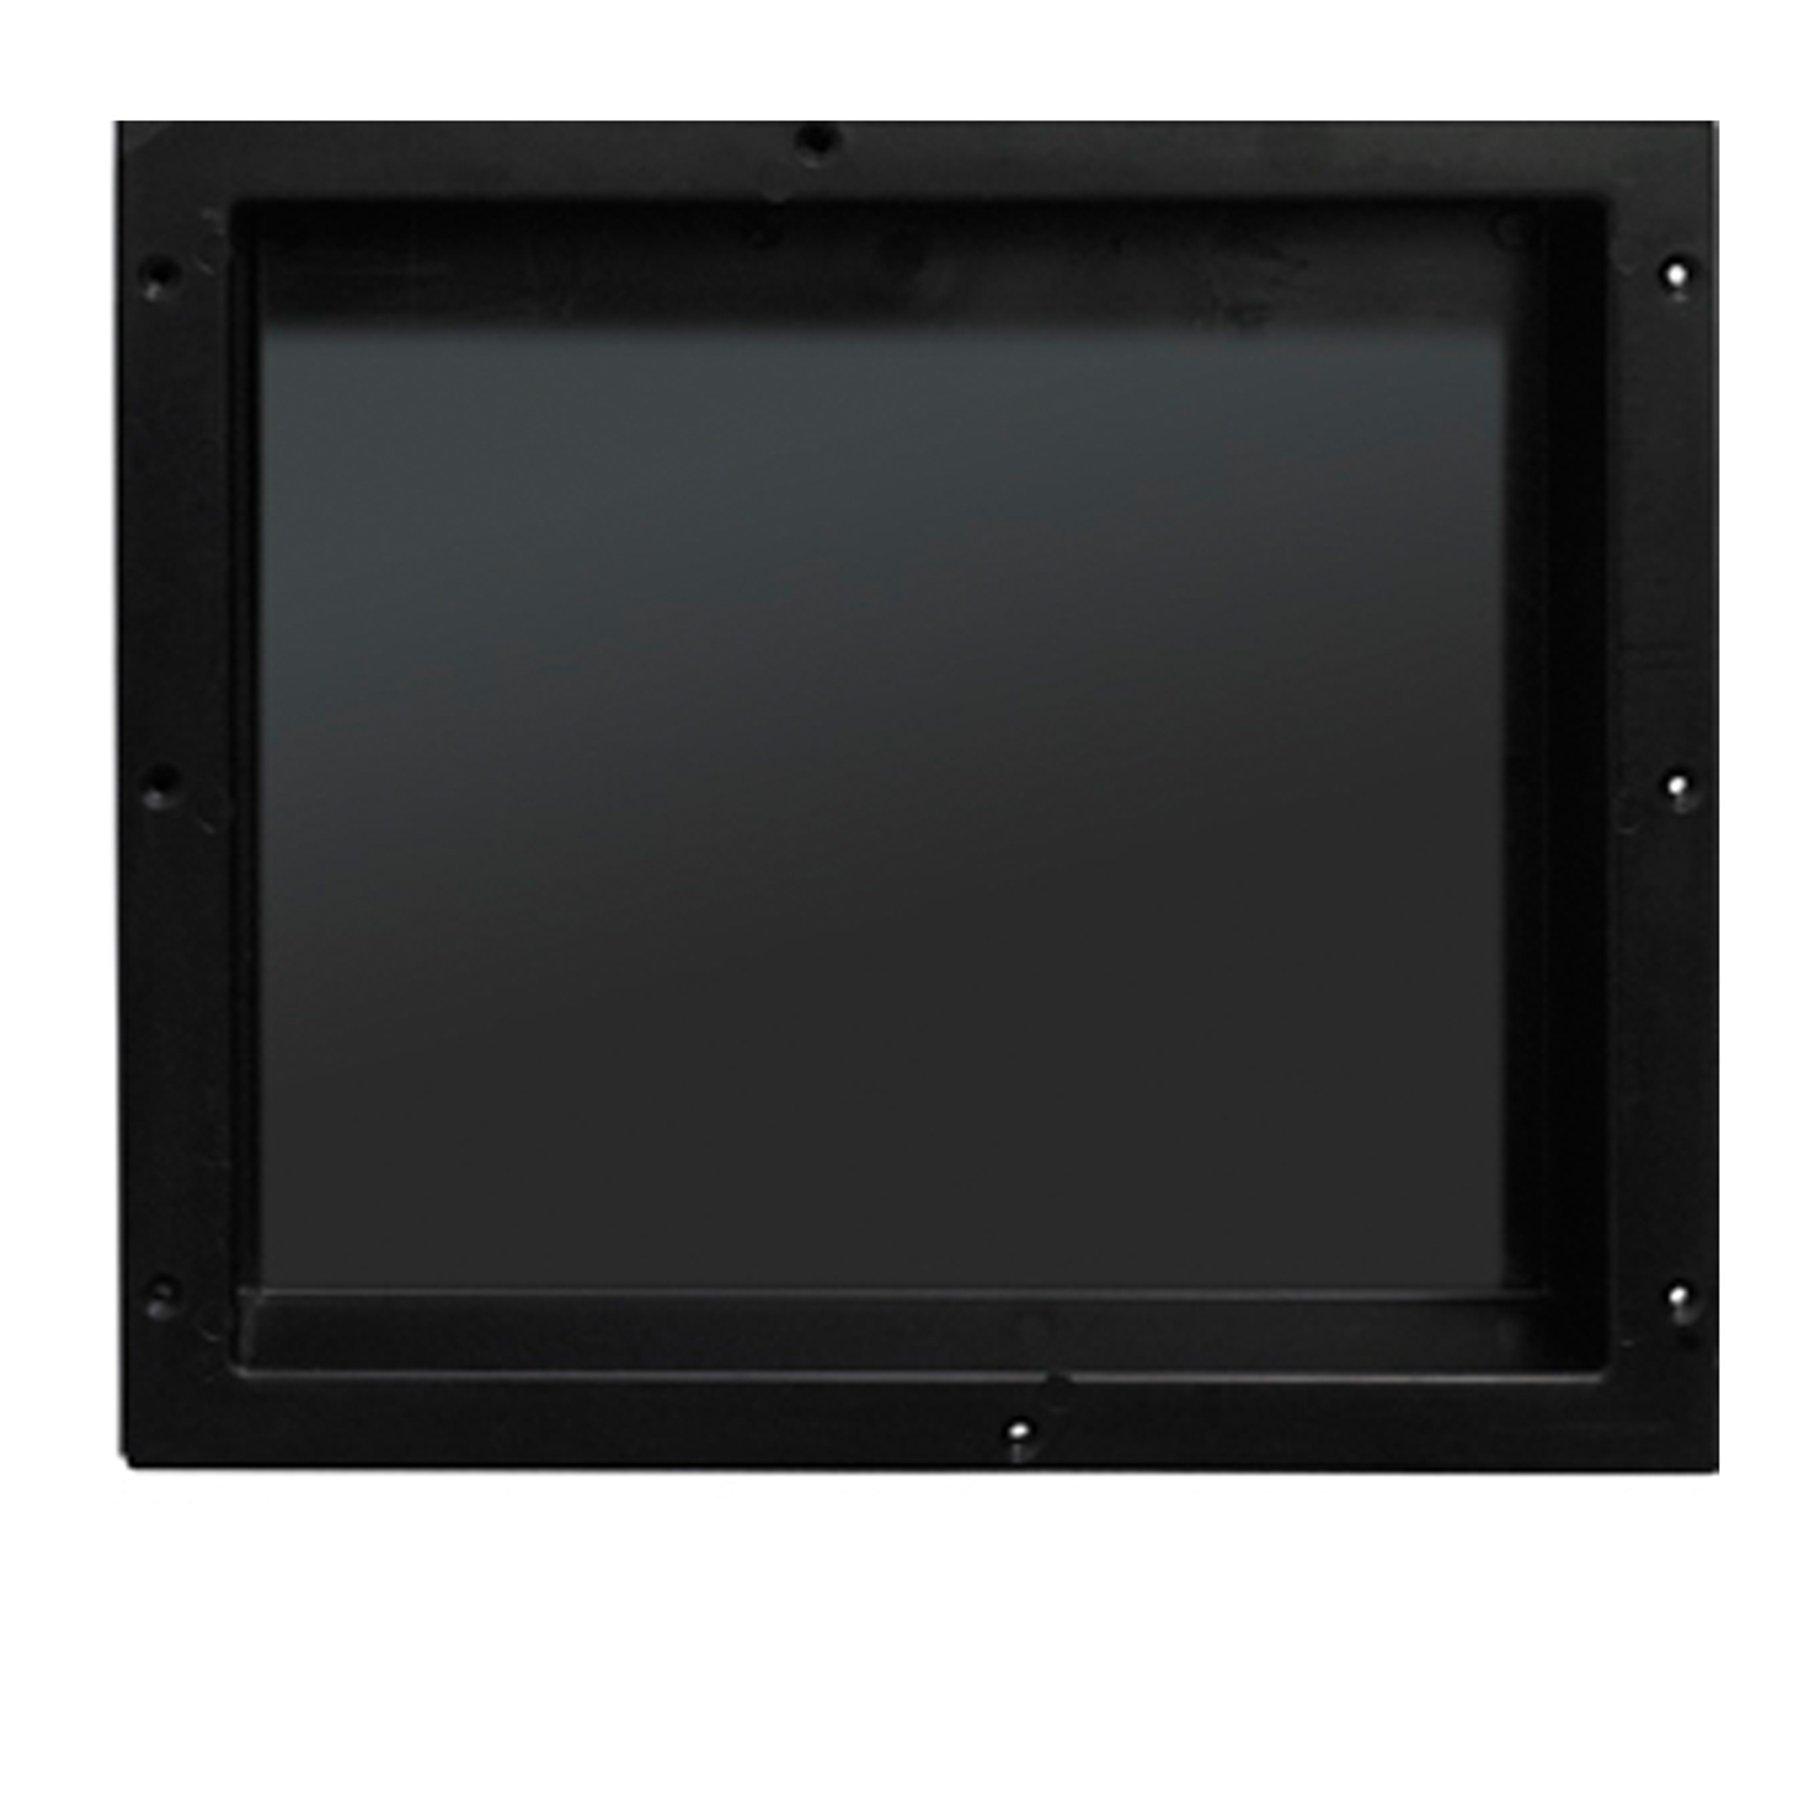 Tile Redi USA 620 RN1614S-BI Niche Single Shelf, 16'' W x 14'' H